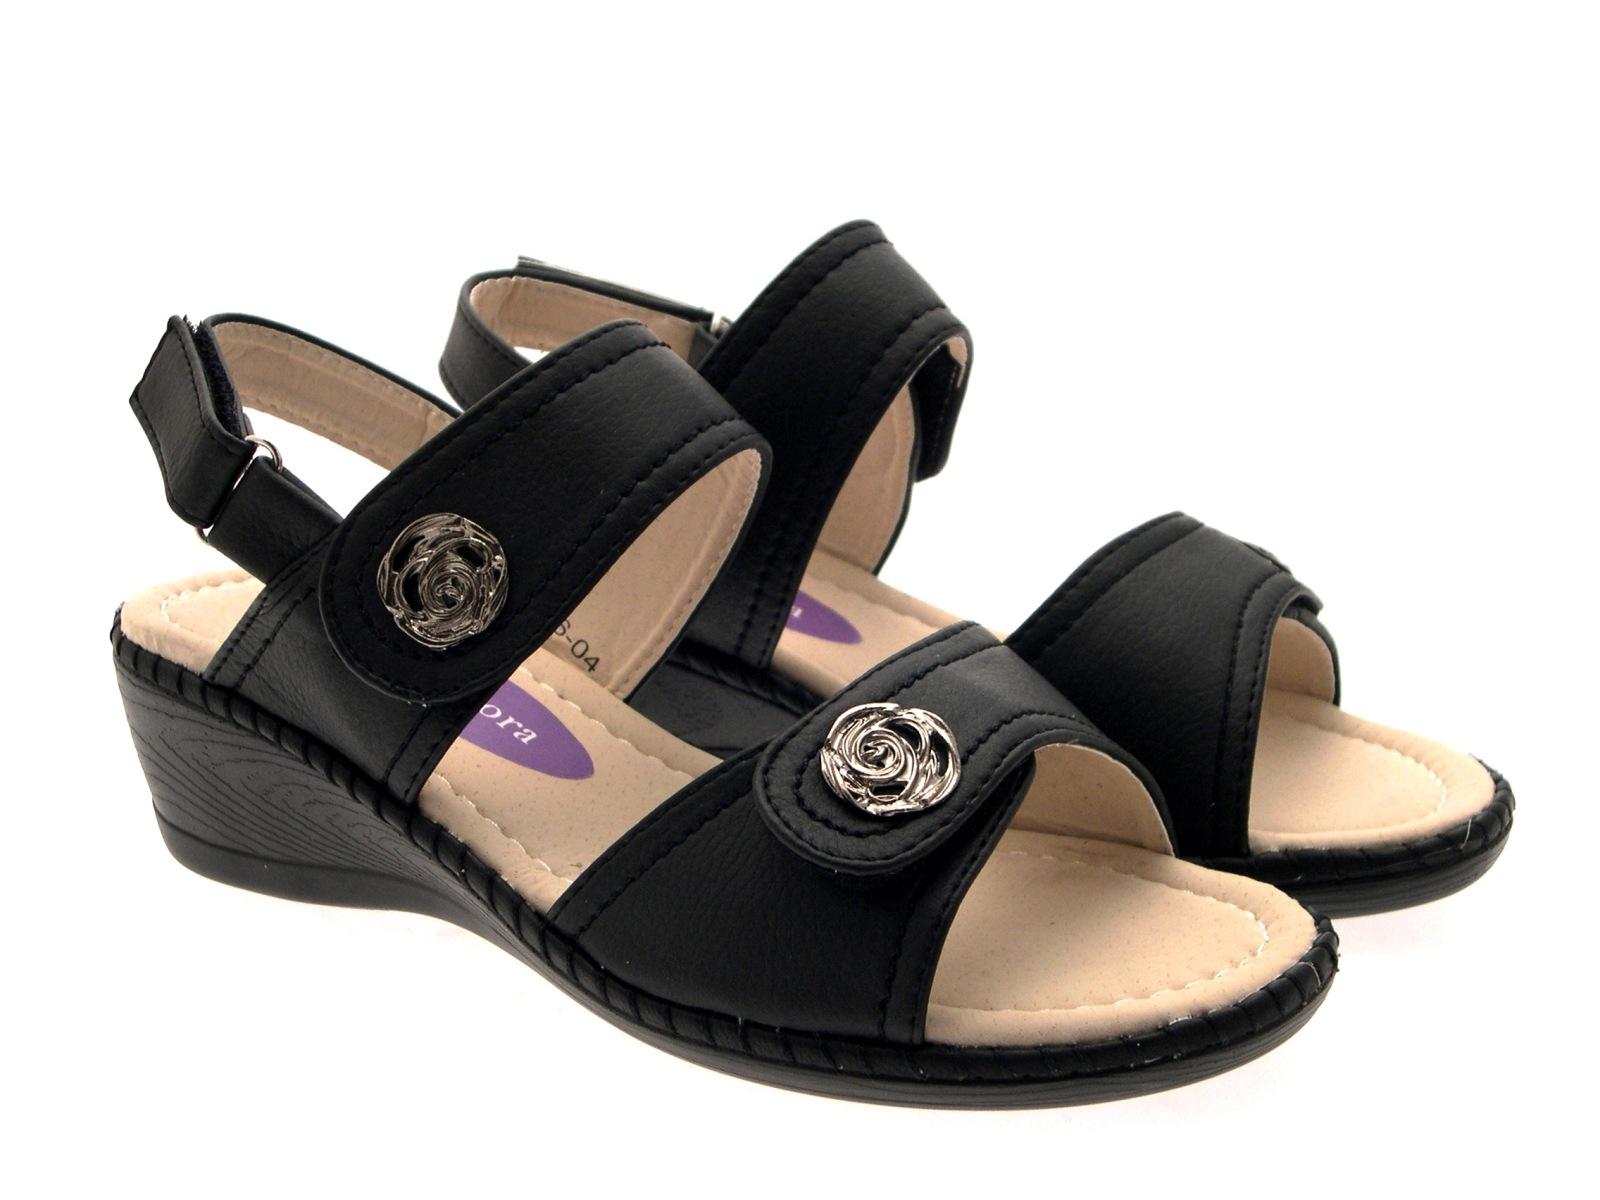 Model Rieker Womens Leather Velcro Strap Sandals Beige | McElhinneys